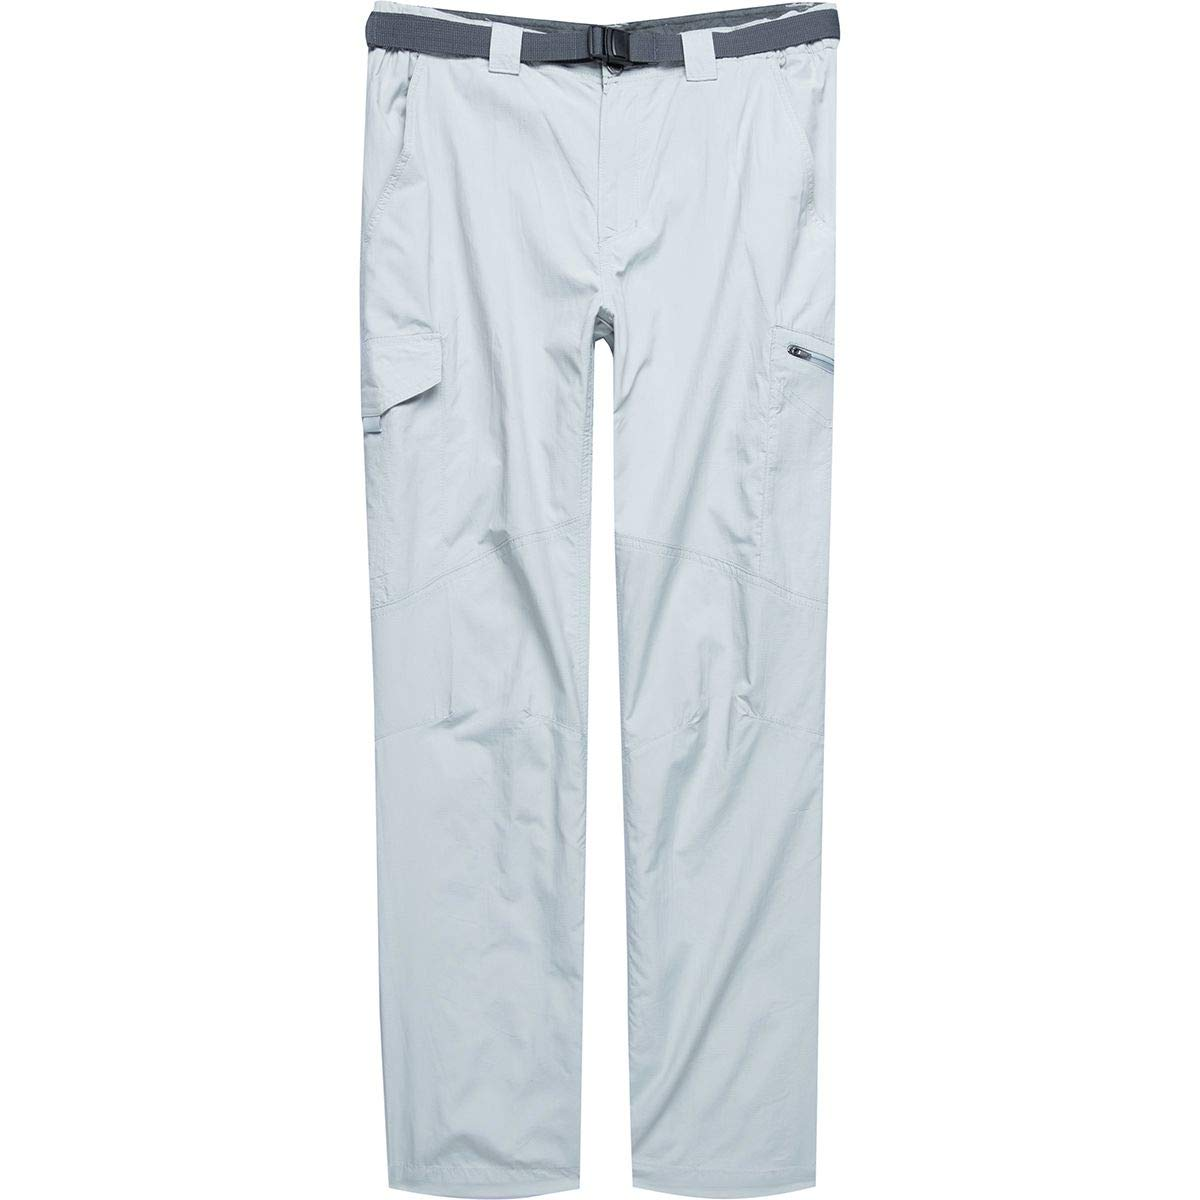 Columbia Men's Silver Ridge Cargo Pant, Cool Grey, 30x30